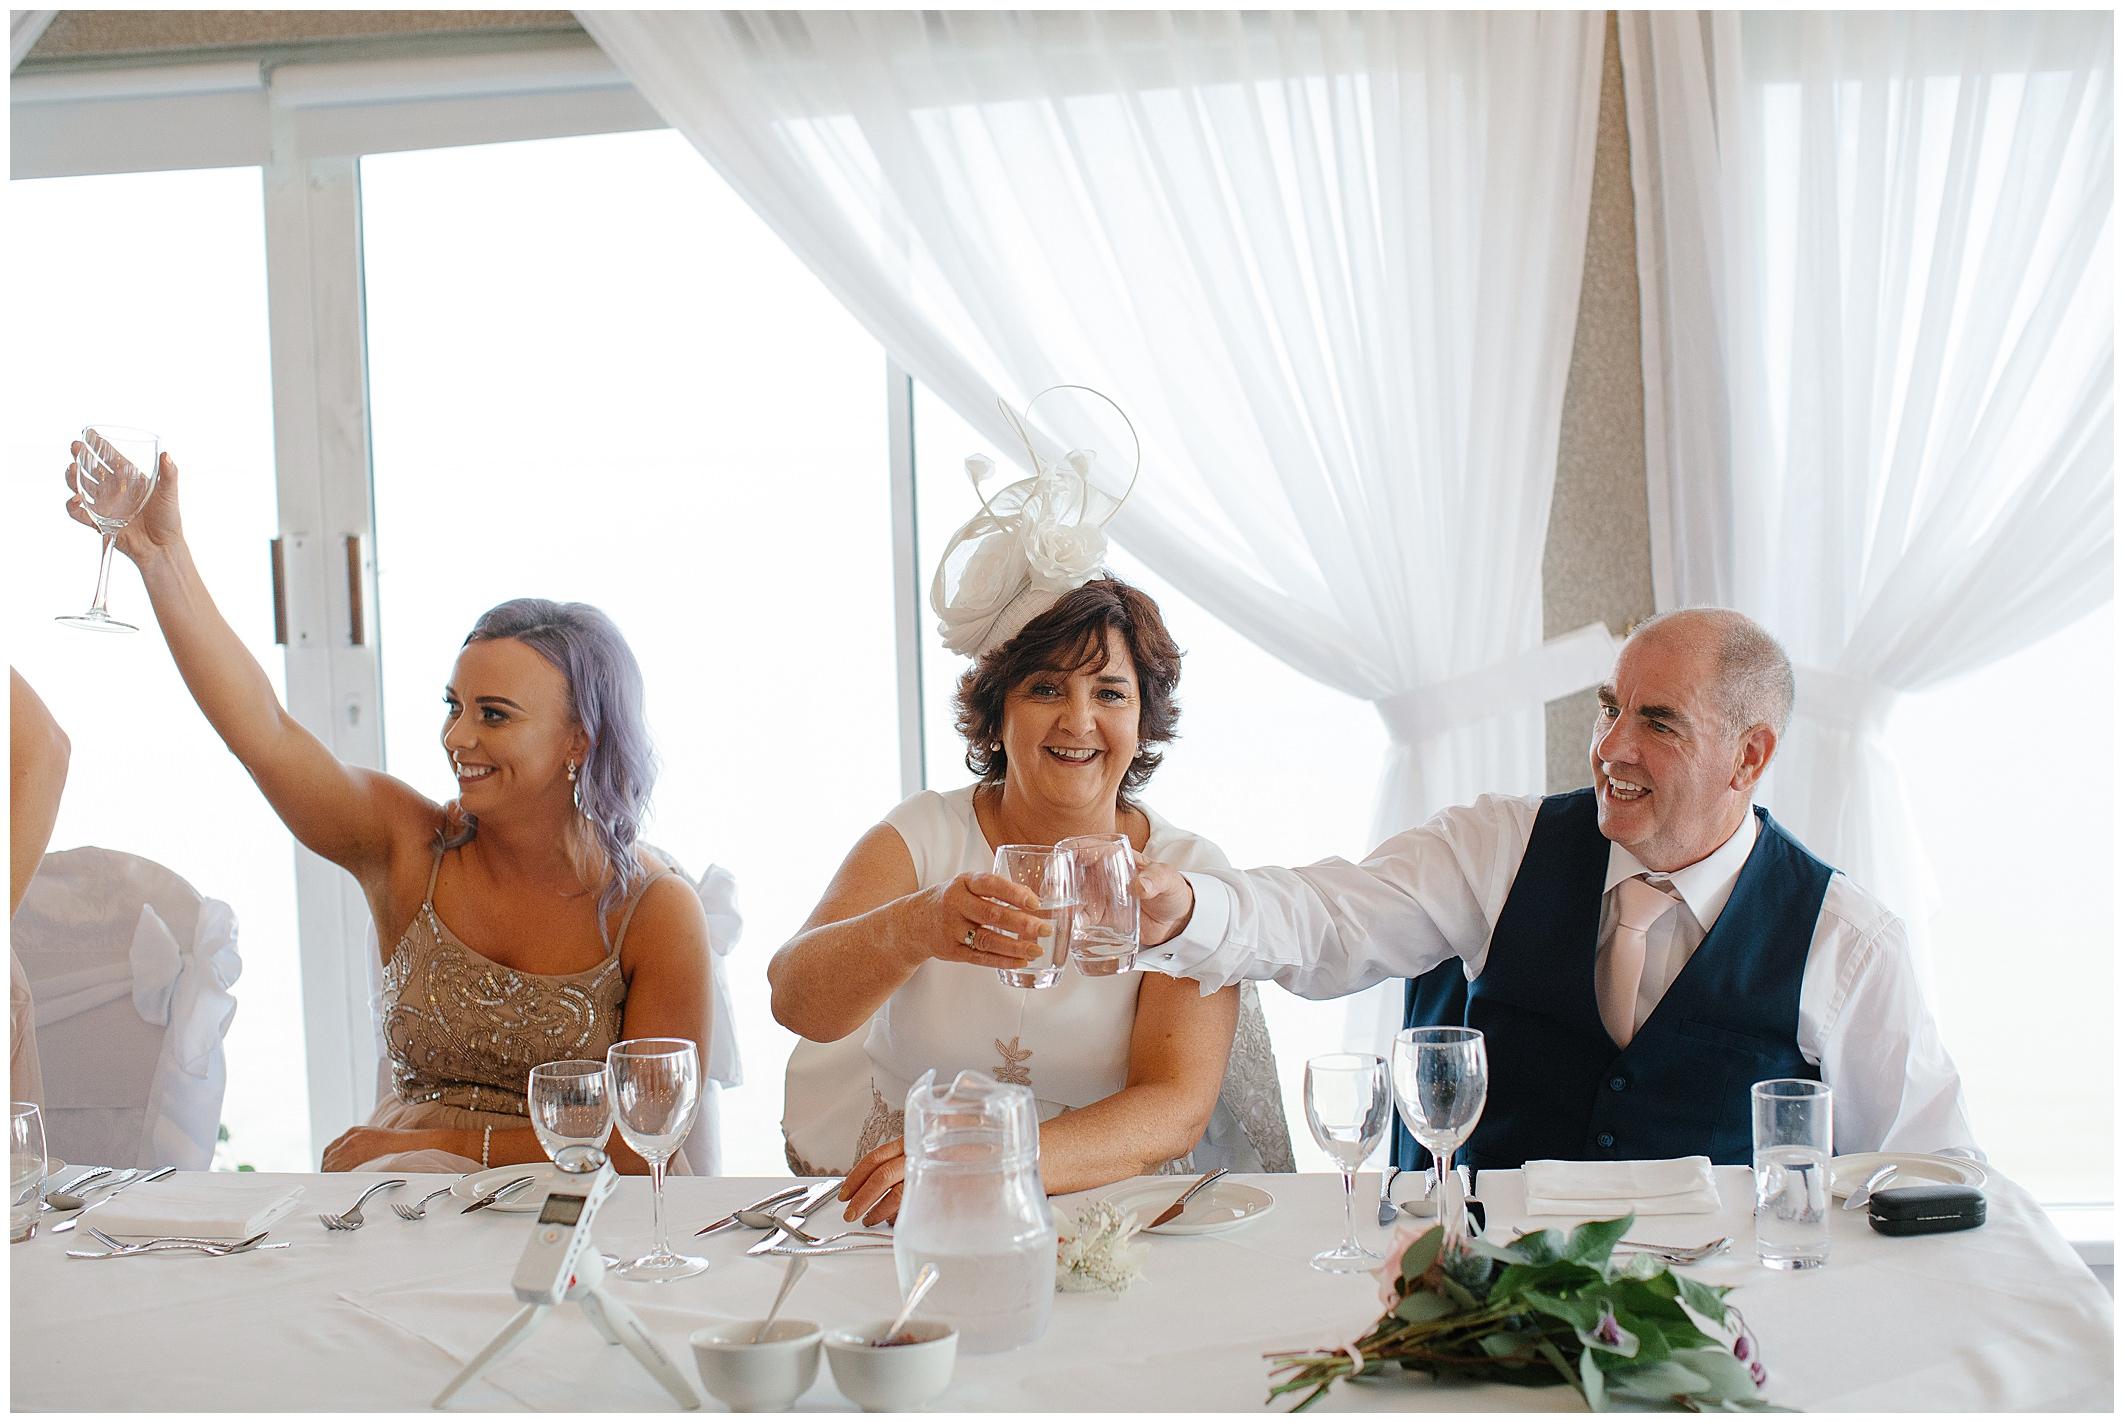 redcastle-hotel-wedding-karen-brian-jude-browne-photography-121.jpg